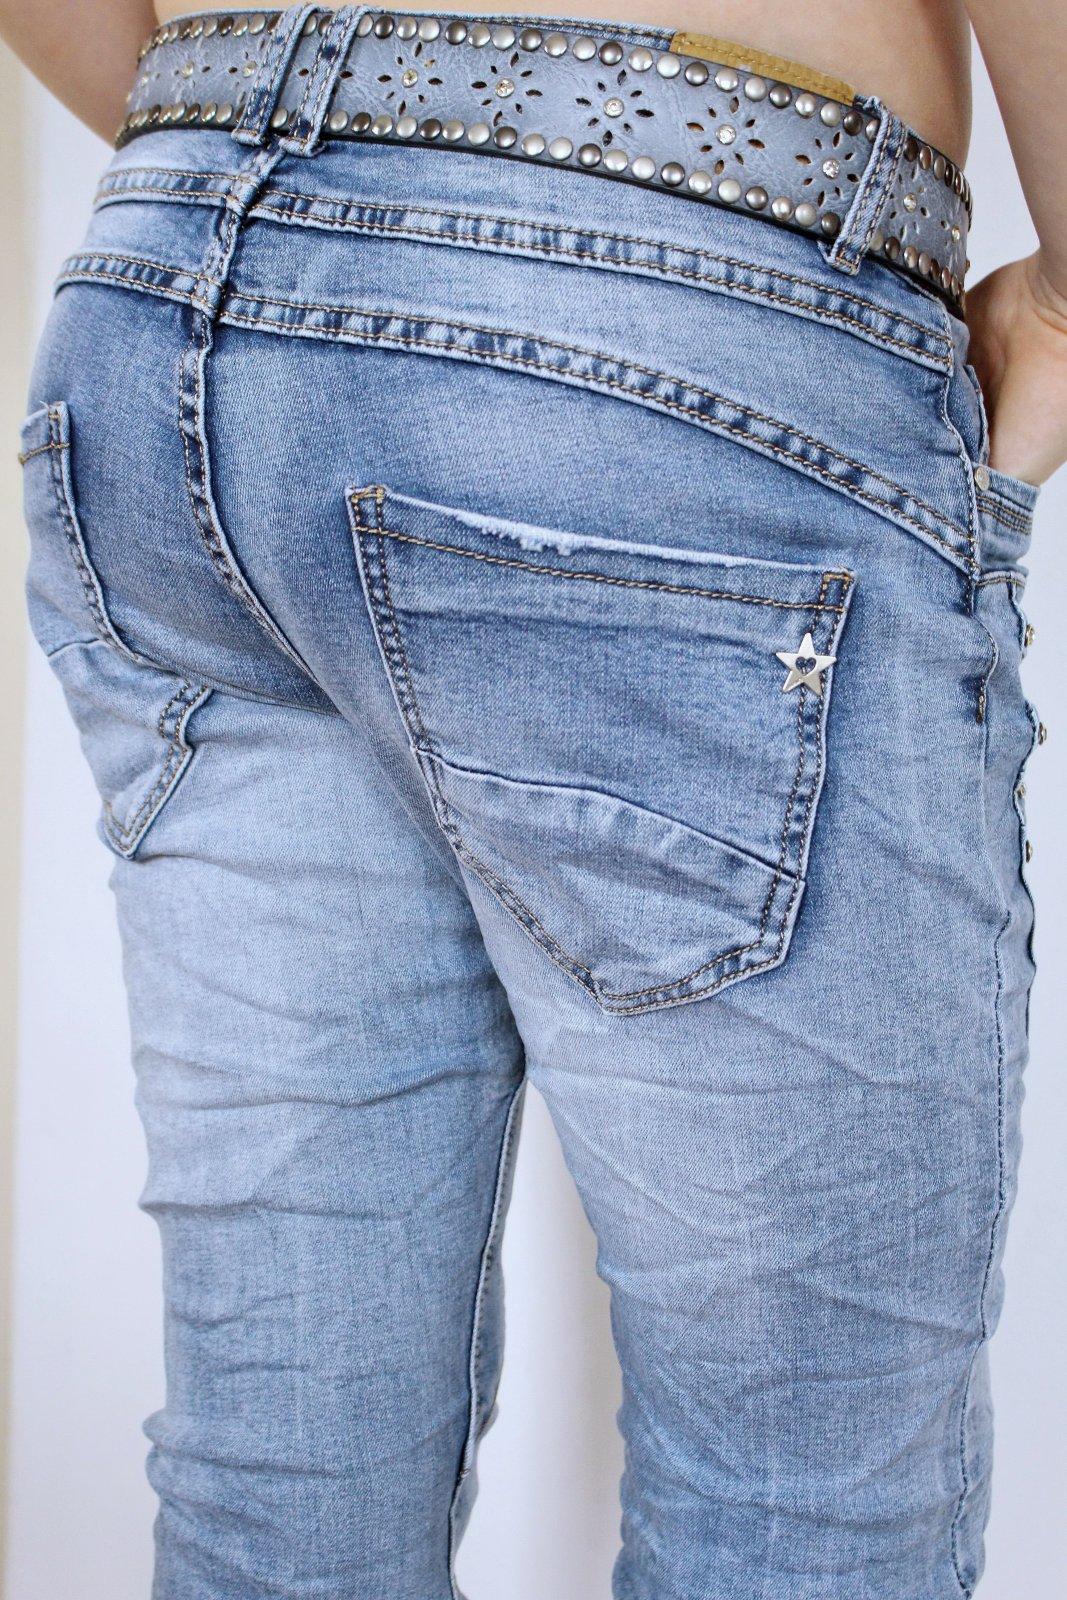 new lexxury glitzer strass boyfriend baggy jeans hose capri shorts bermuda blau ebay. Black Bedroom Furniture Sets. Home Design Ideas